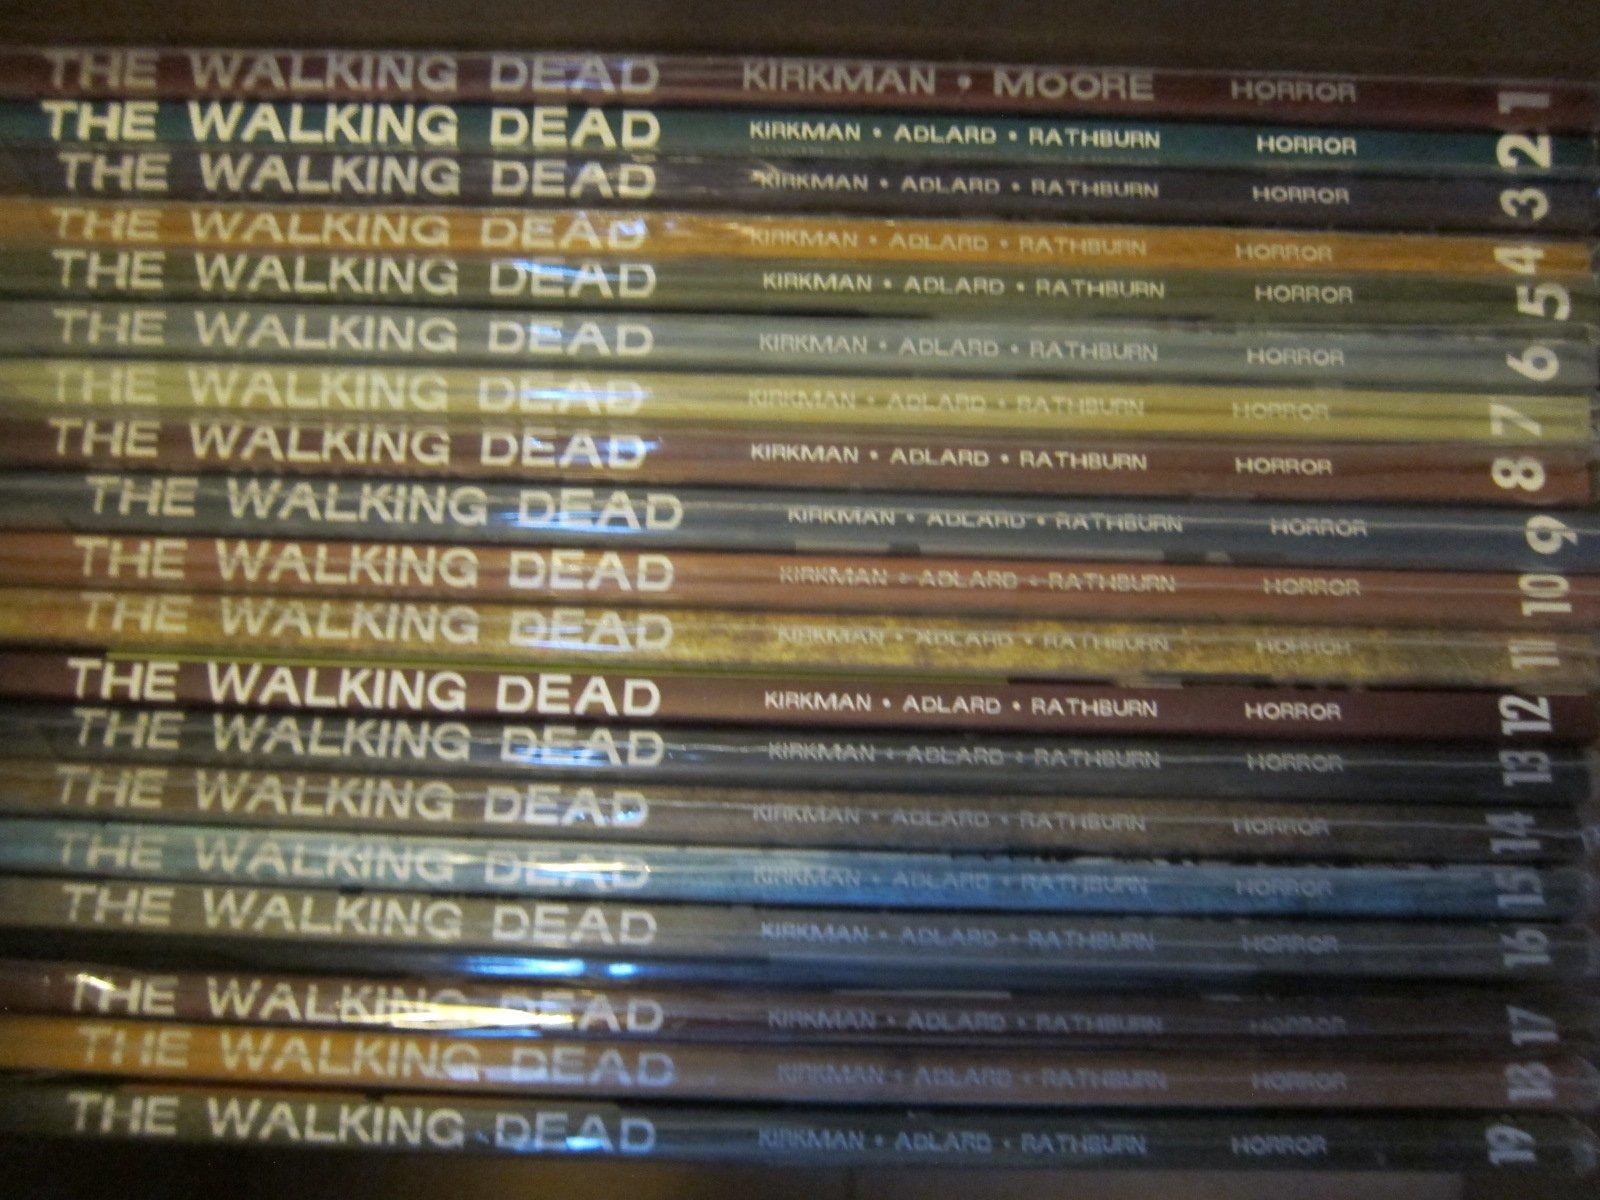 The Walking Dead Comic Book Collection 1 19 Reprints Comics 1 114 Full Run Lot Robert Kirkman 0753677438156 Books